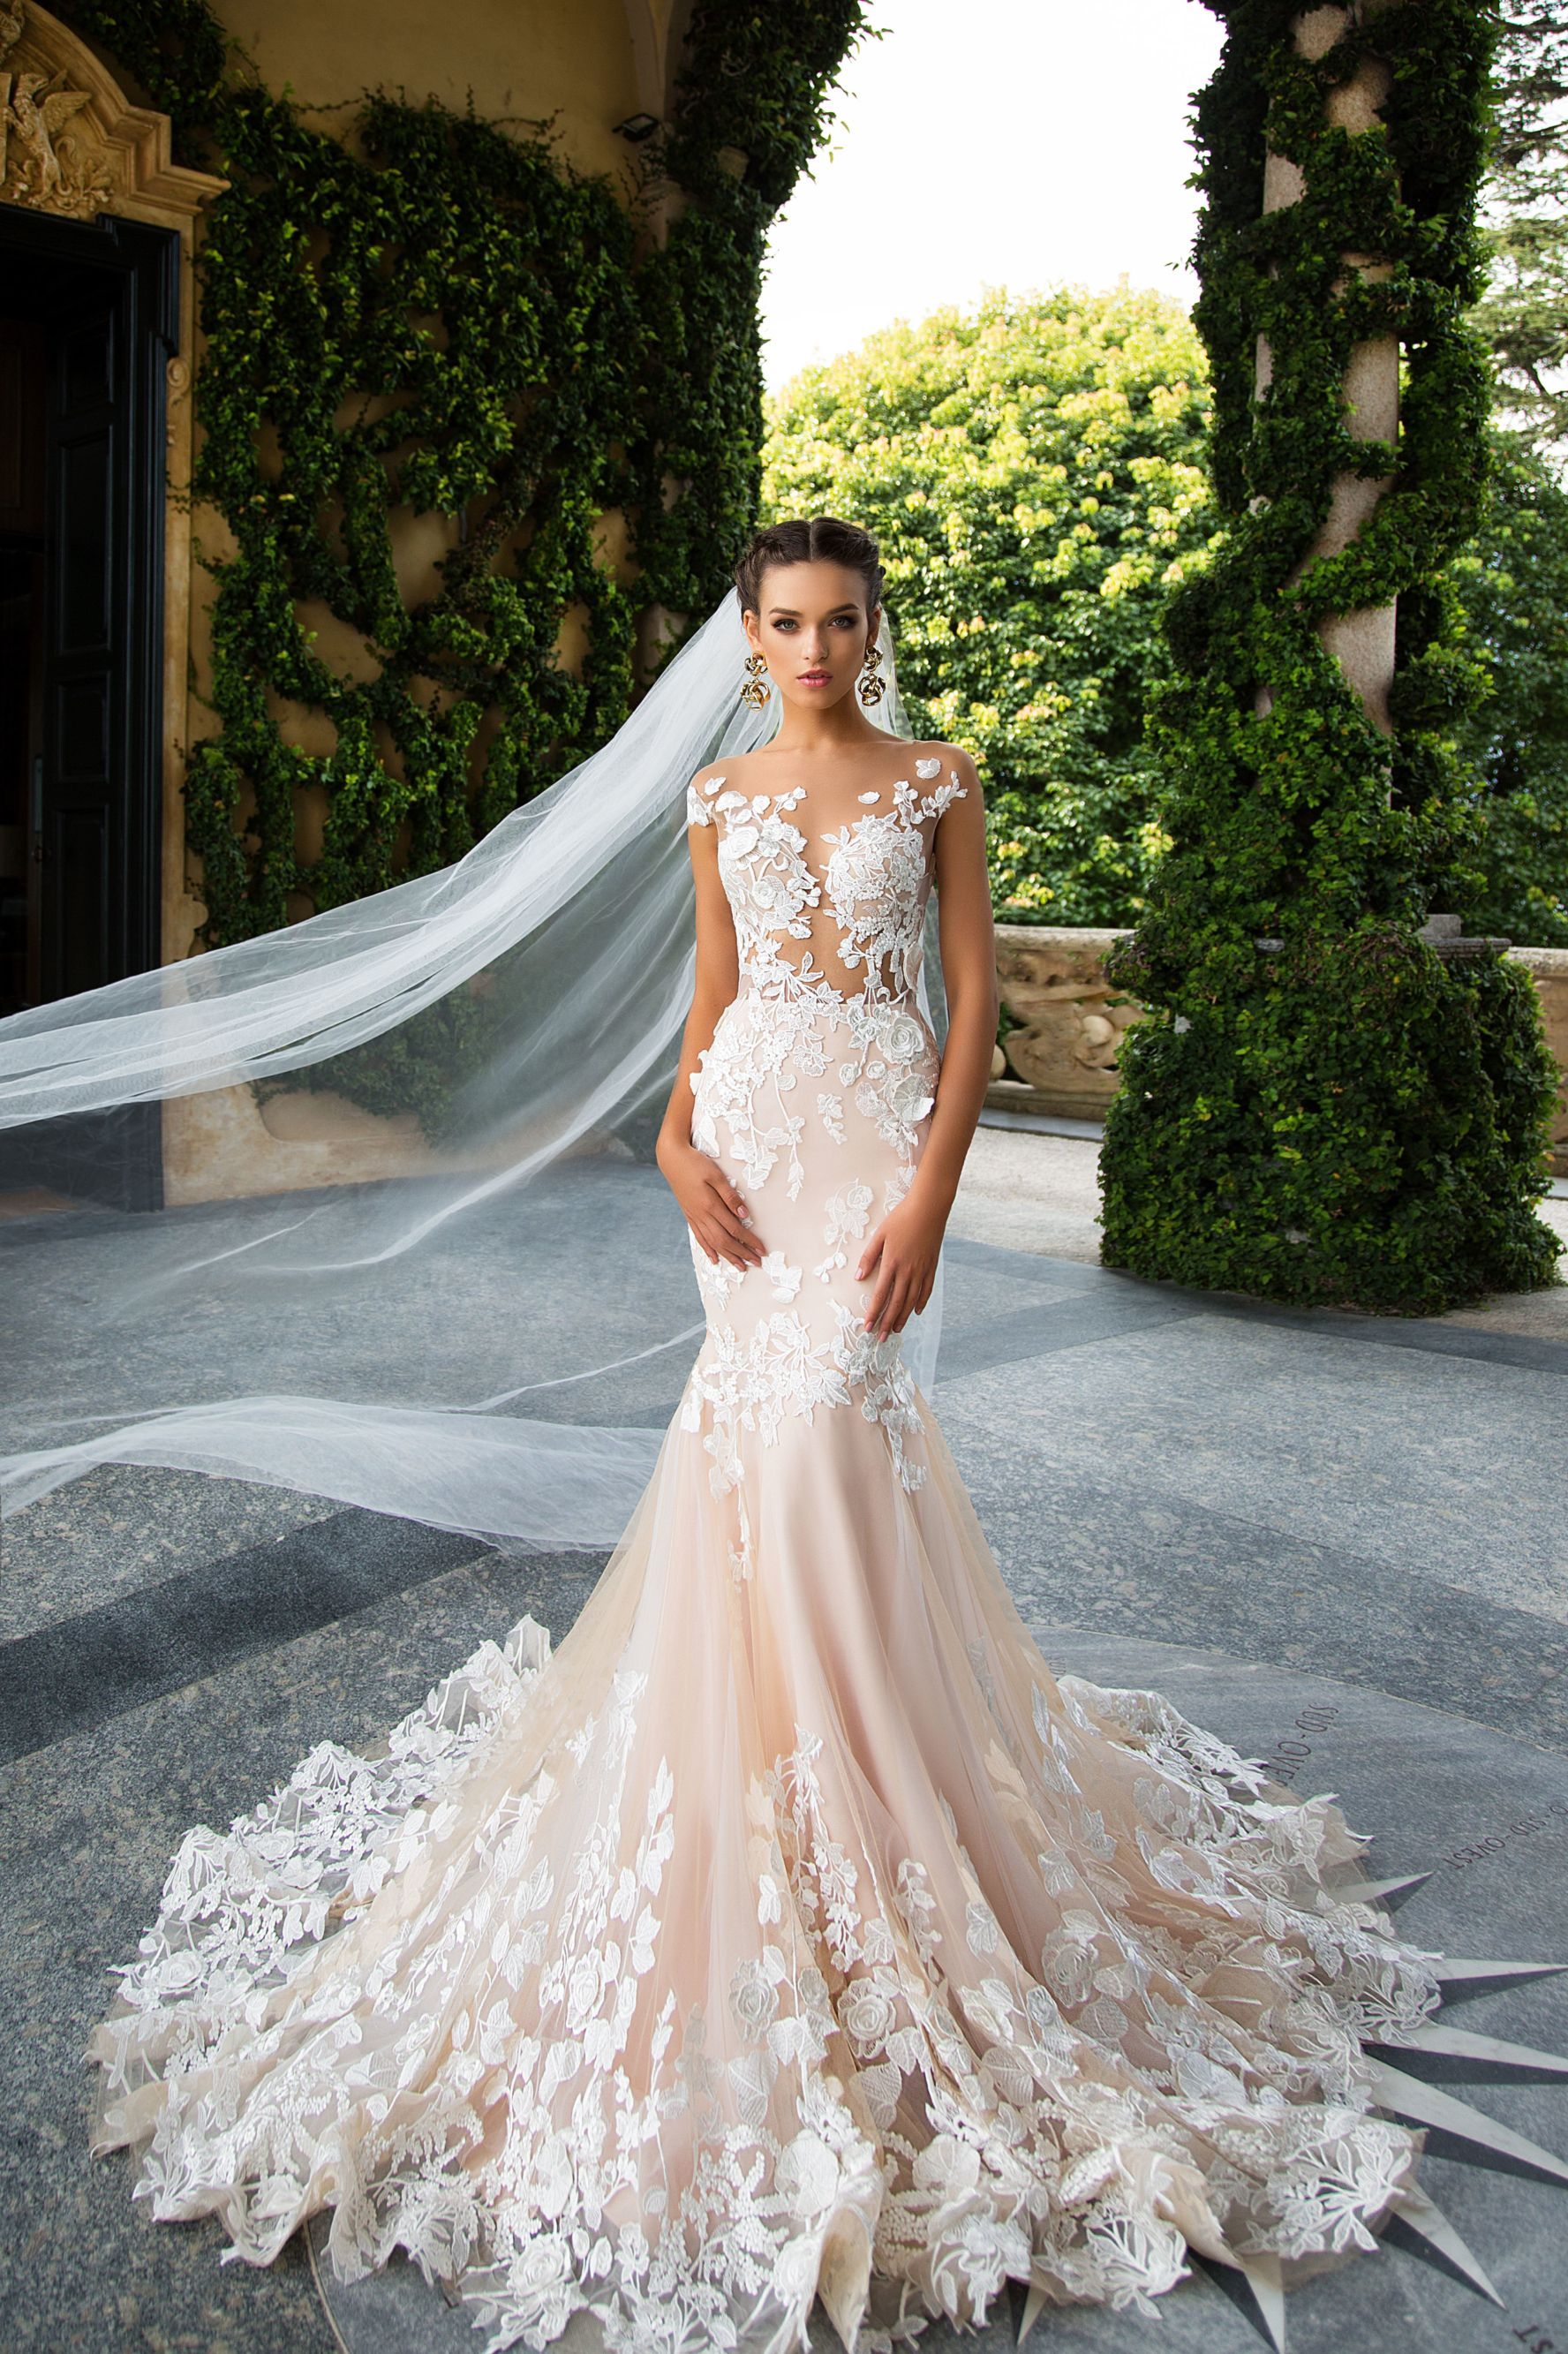 betti2 | Wedding | Pinterest